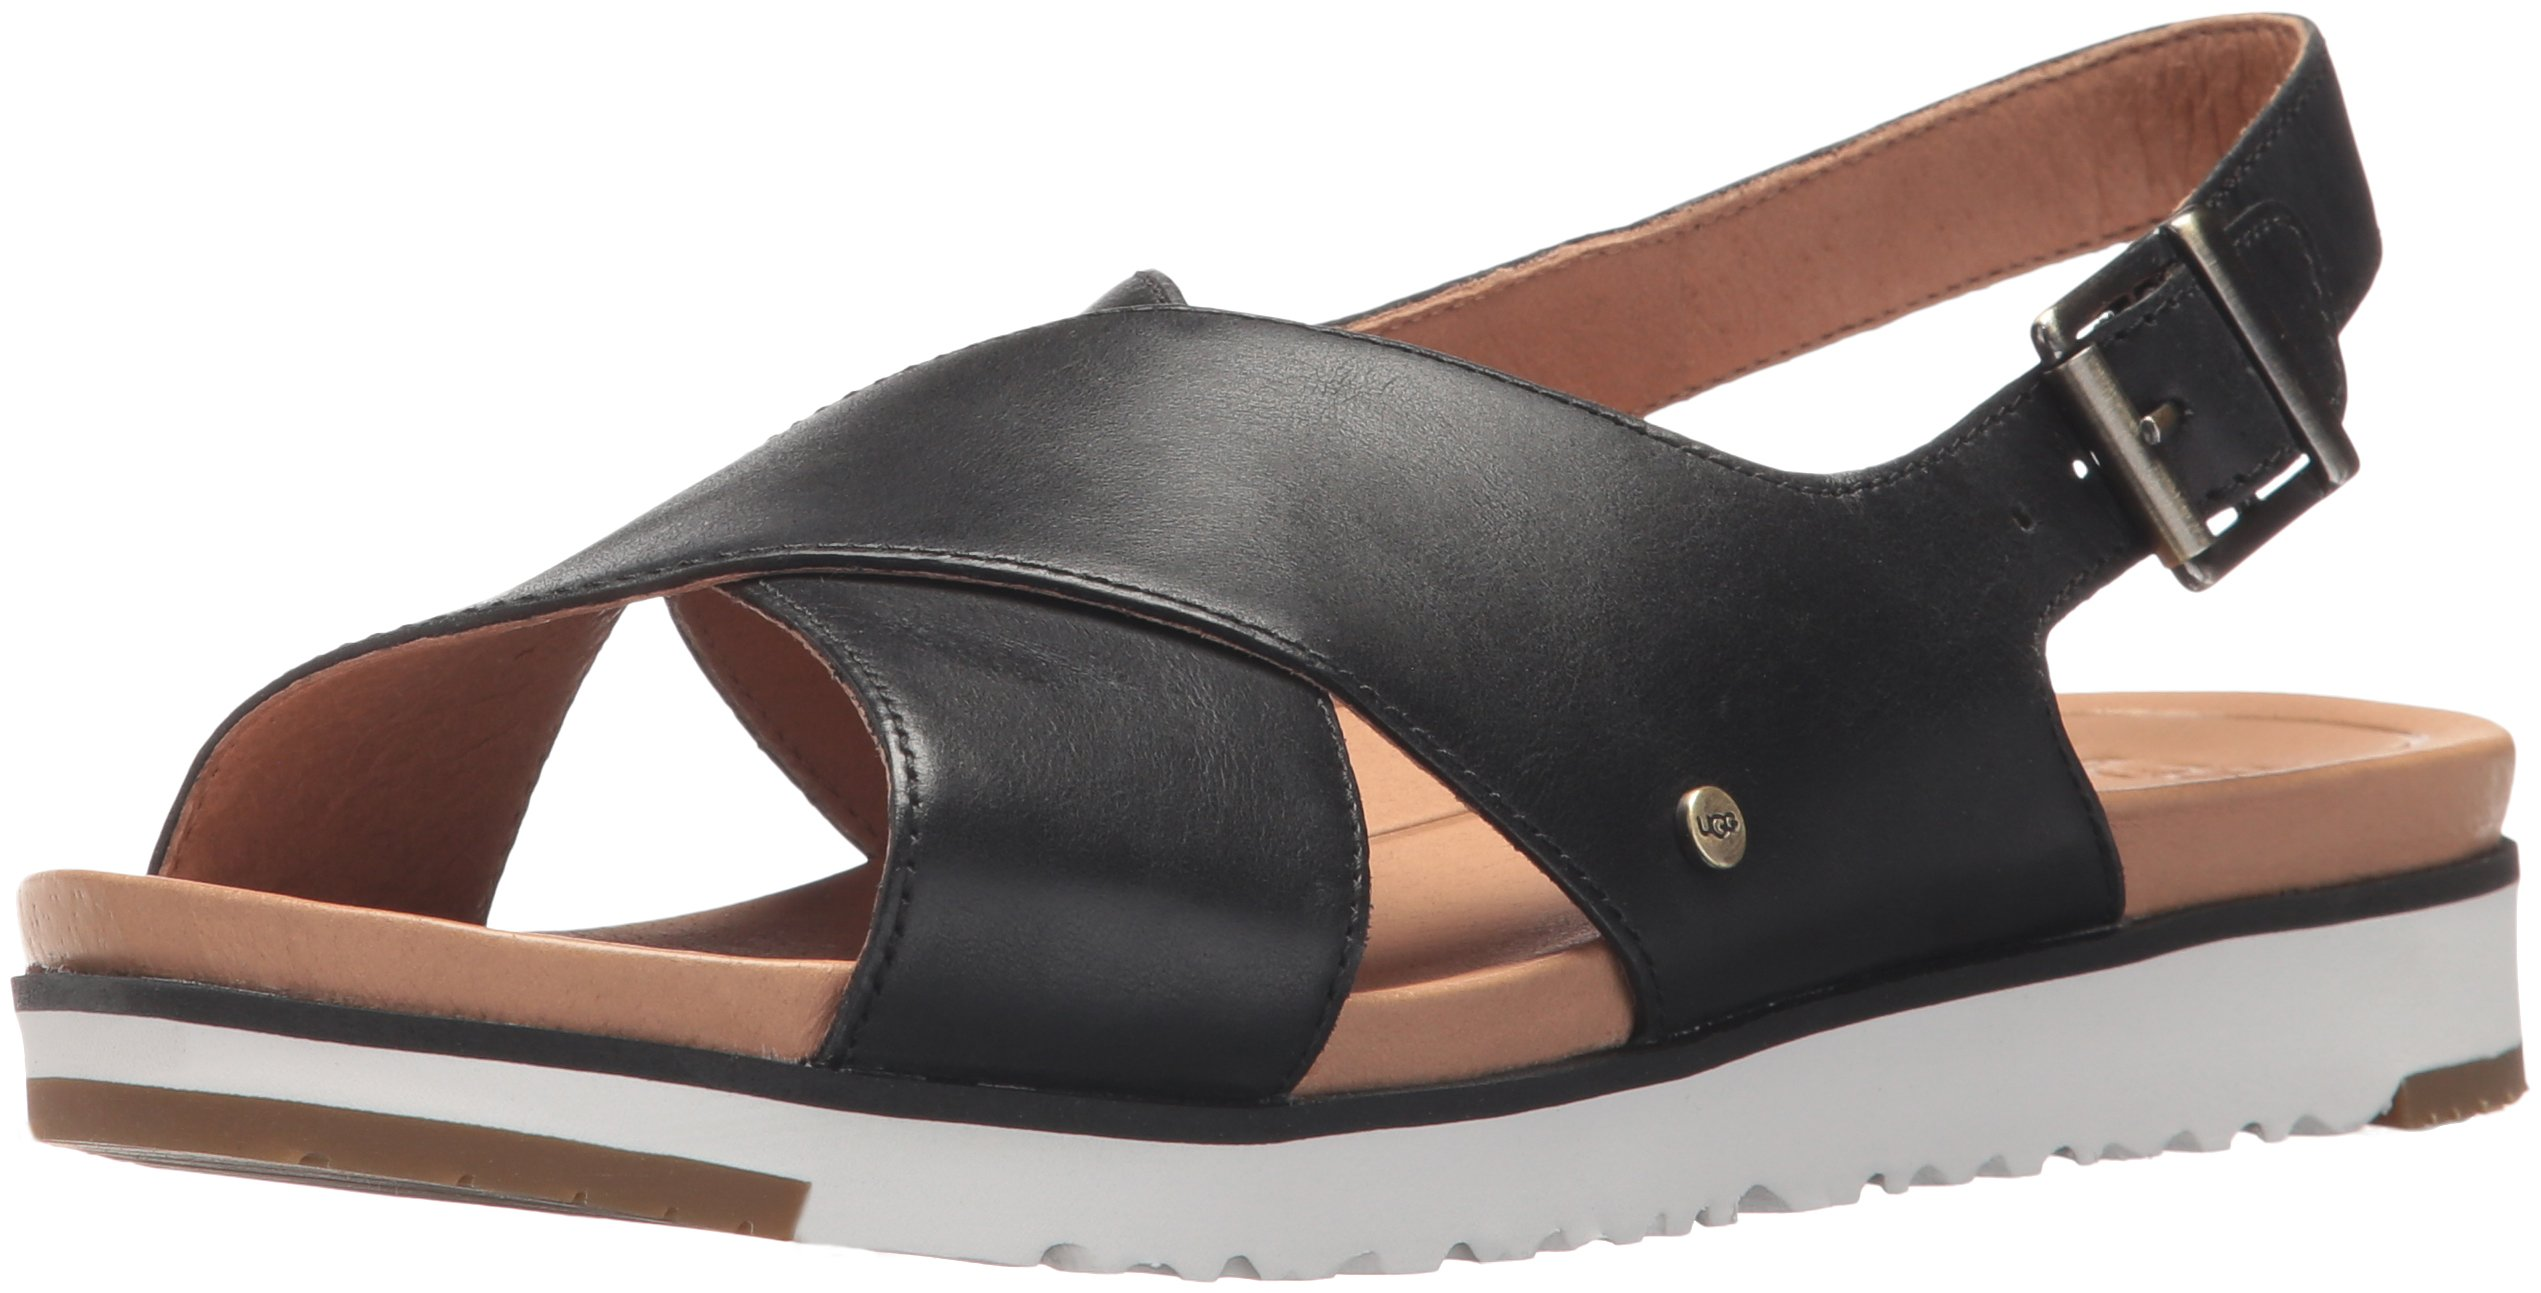 UGG Australia Women's Kamile Flat Sandal